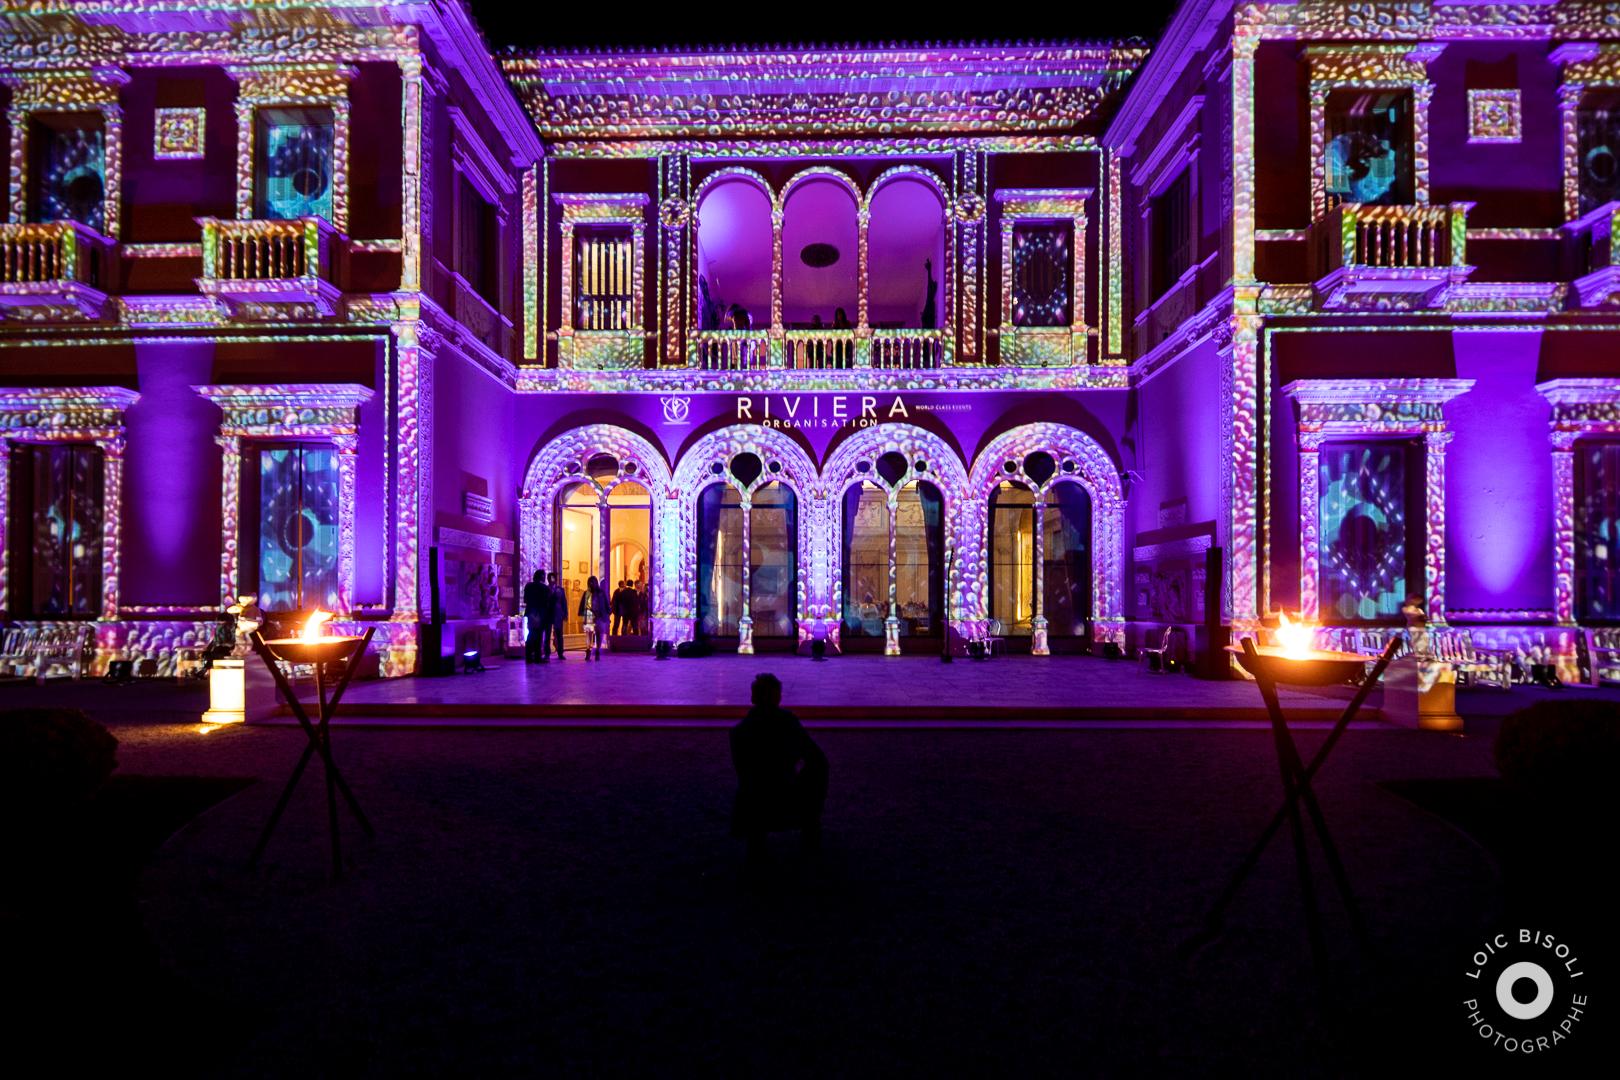 aucop-event-Villa Ephrussi de Rothschild-Studio Loic Bisoli-french riviera